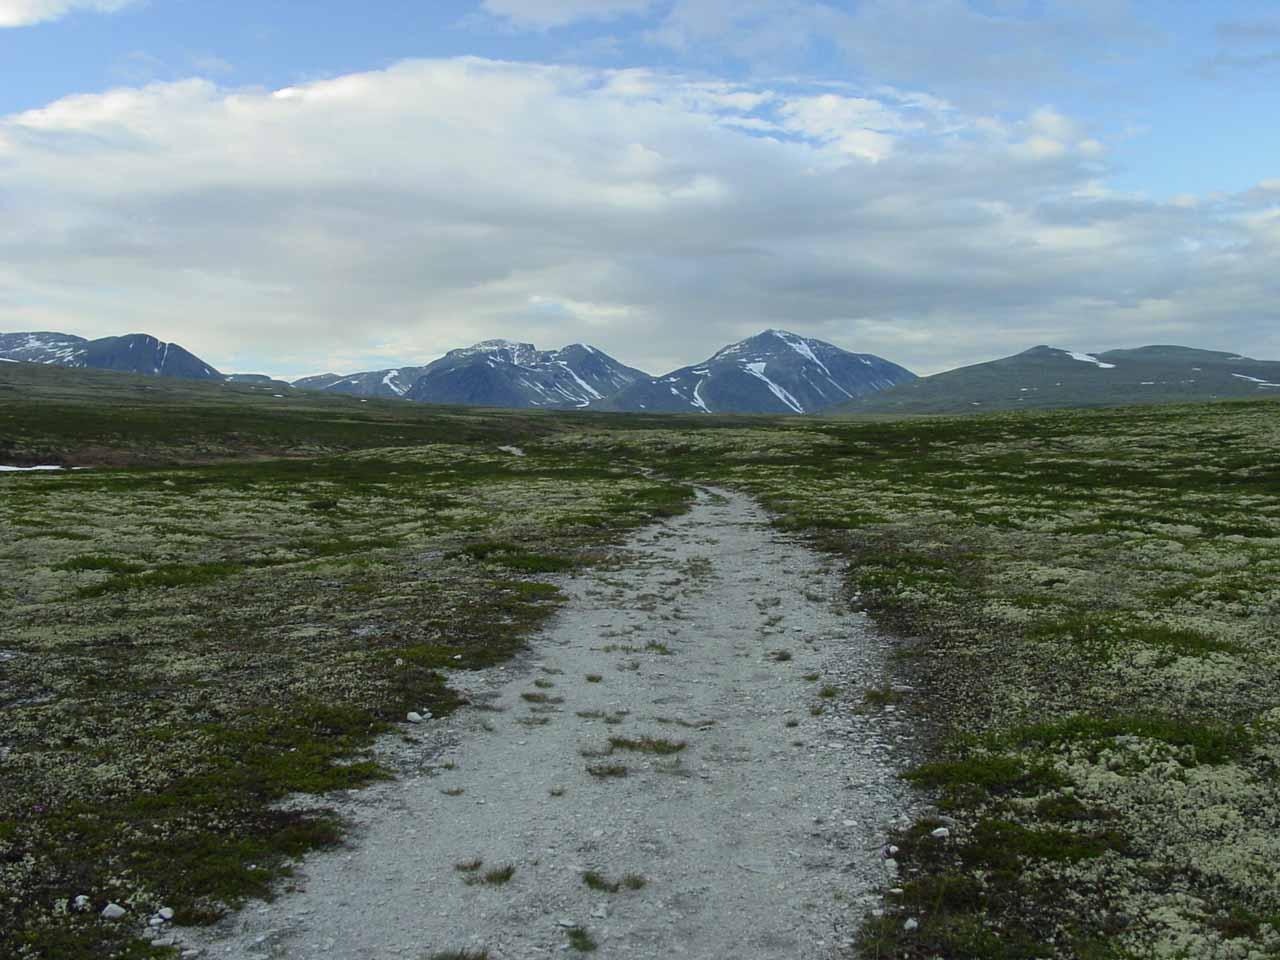 Hiking amidst the wide open plateau and tundra of Rondane Nasjonalpark